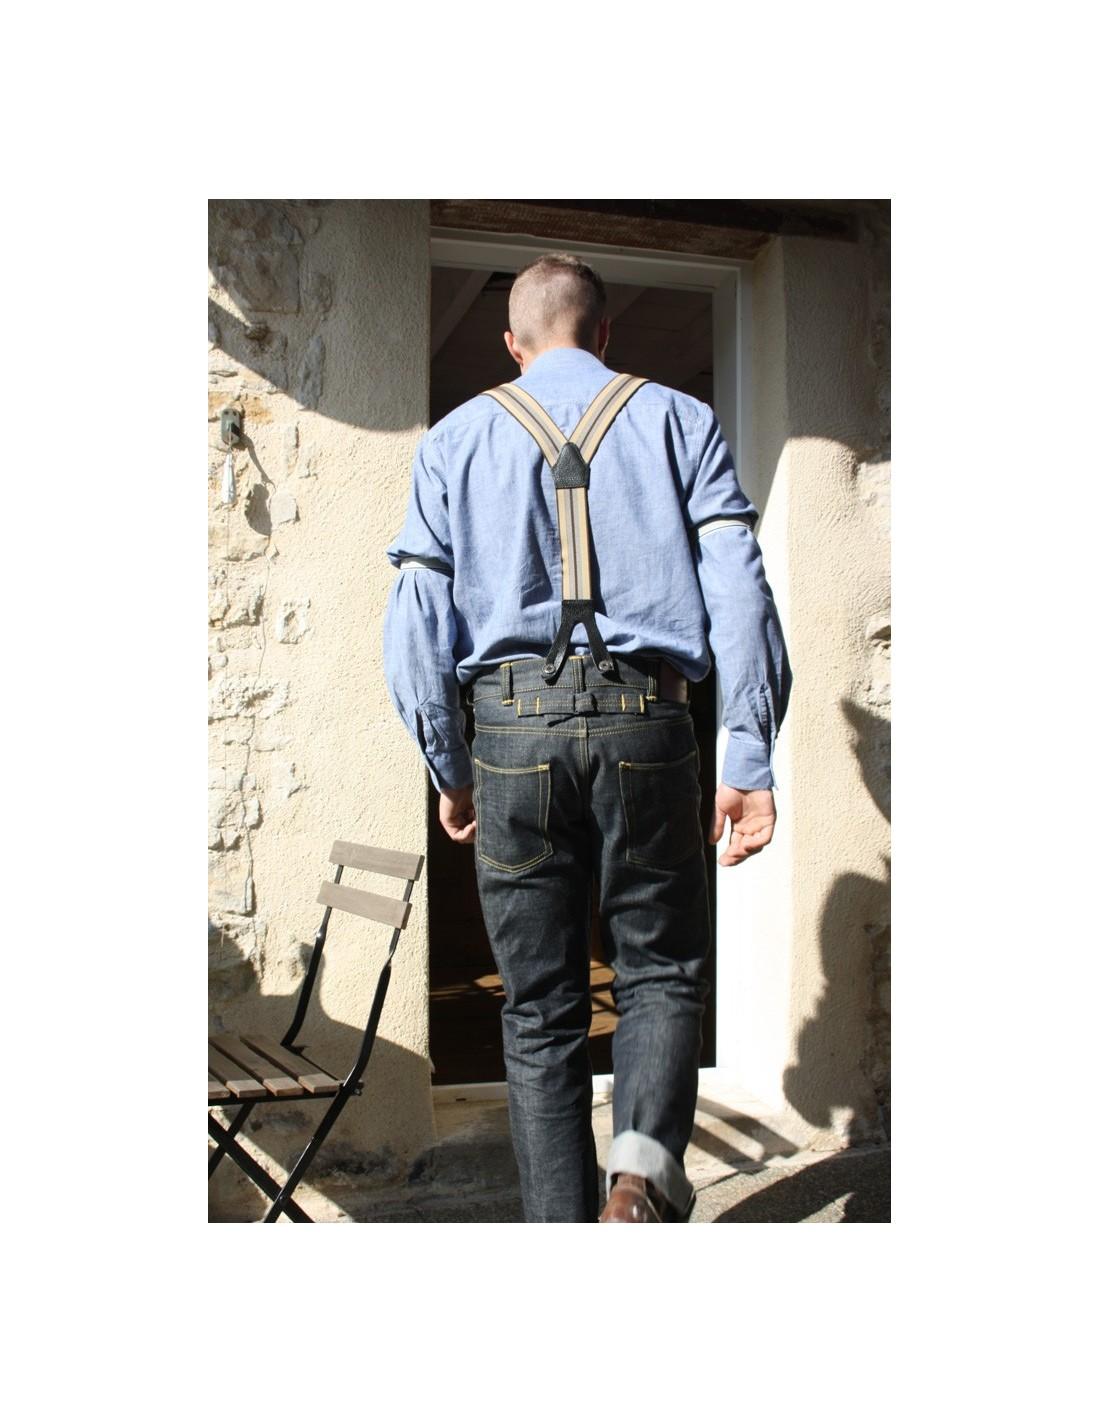 Bretelle Pantalon Bretelle Et Et Retro Homme Pantalon A5q34LjR